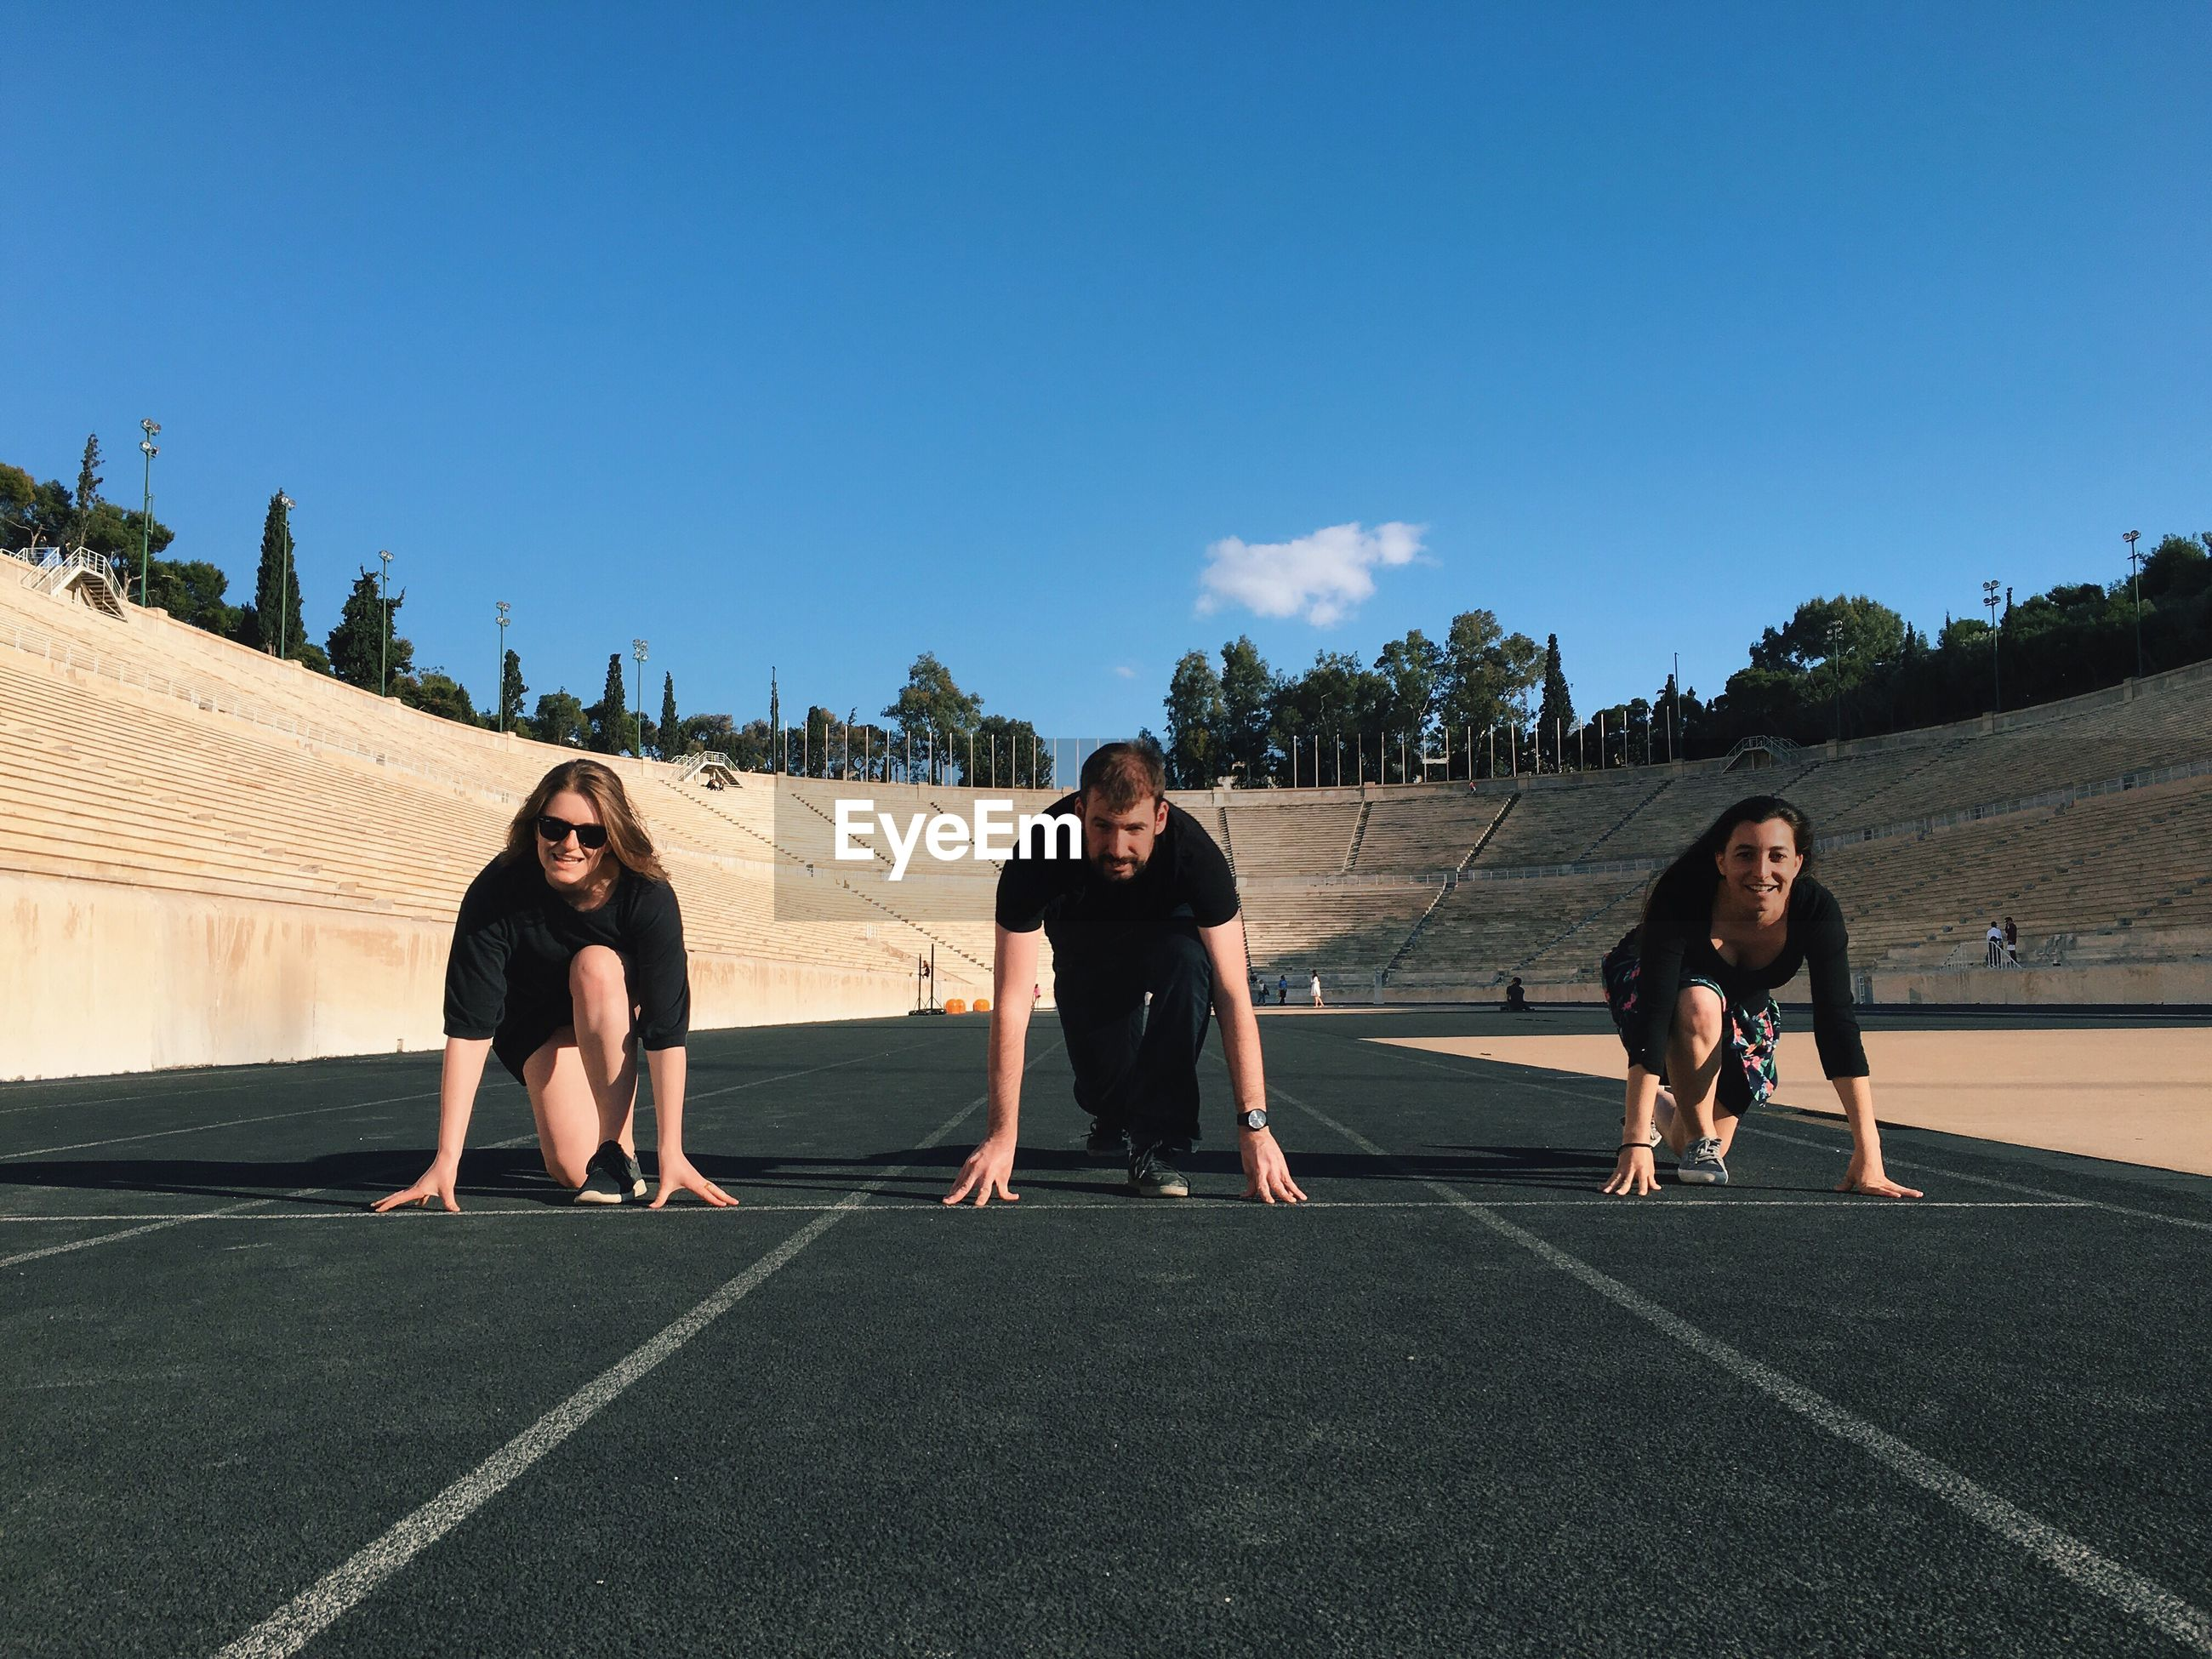 Friends poised on track at panathinaiko stadium